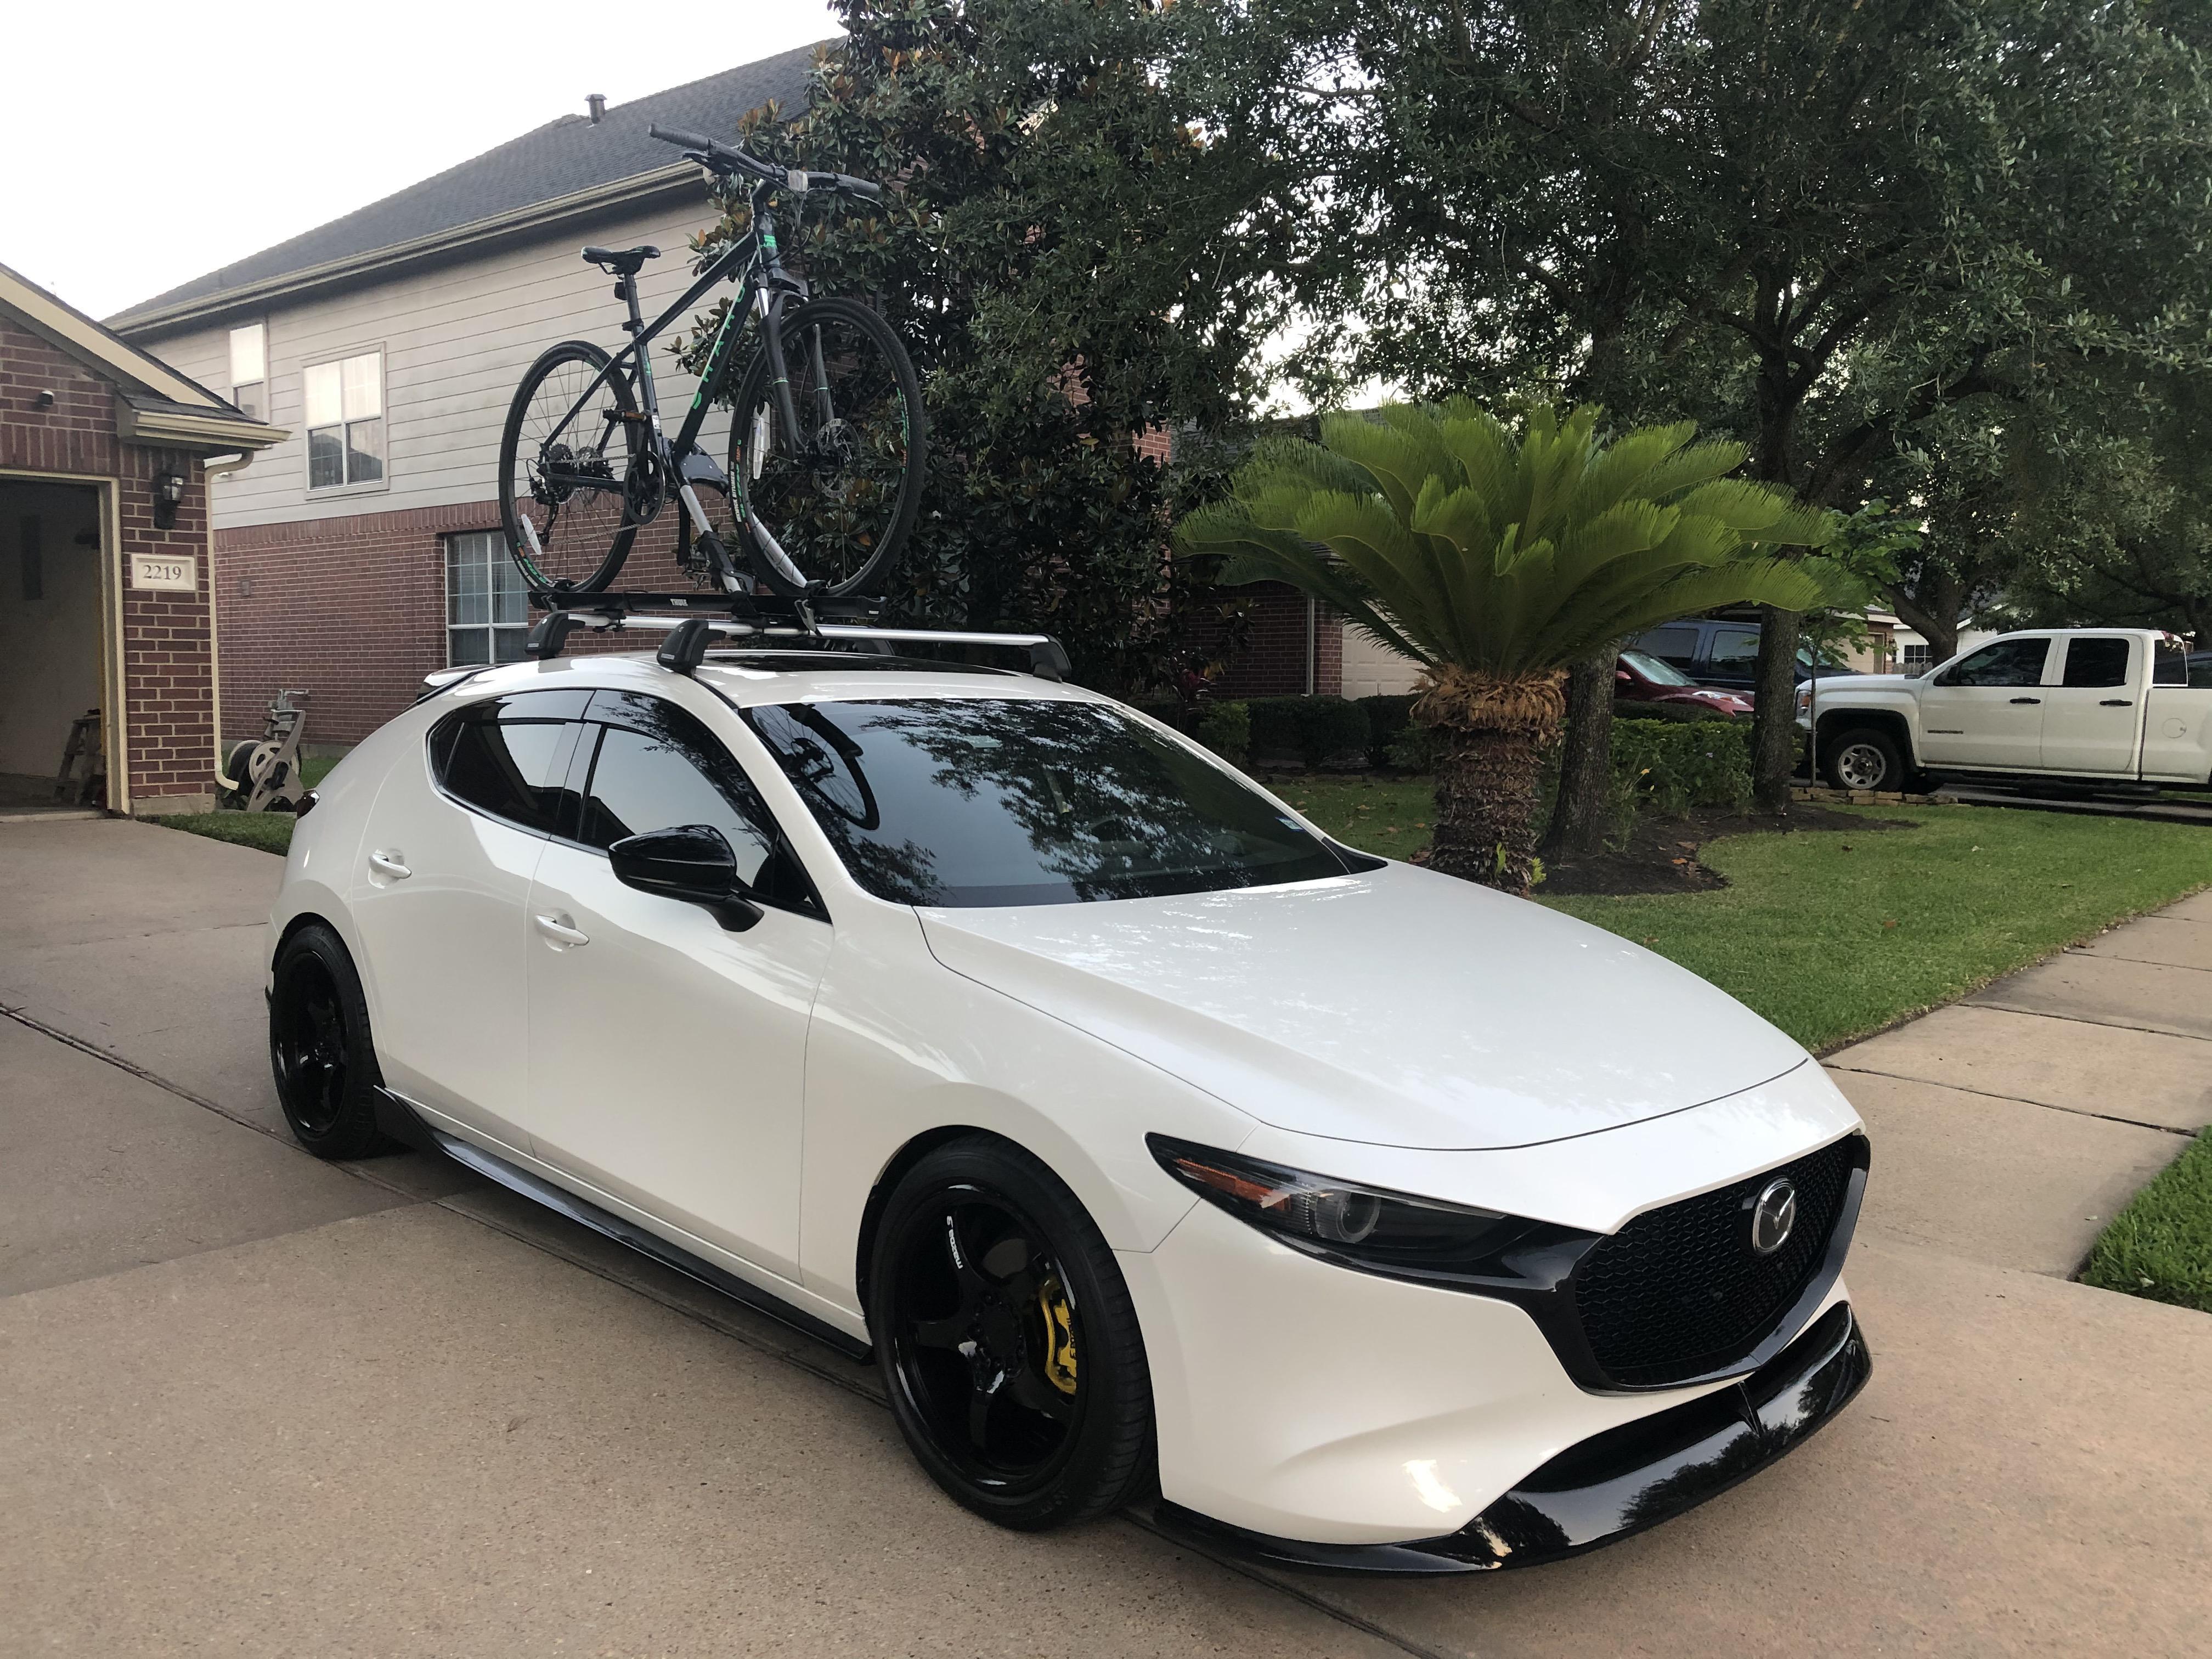 mazda 3 bike carrier off 64 www